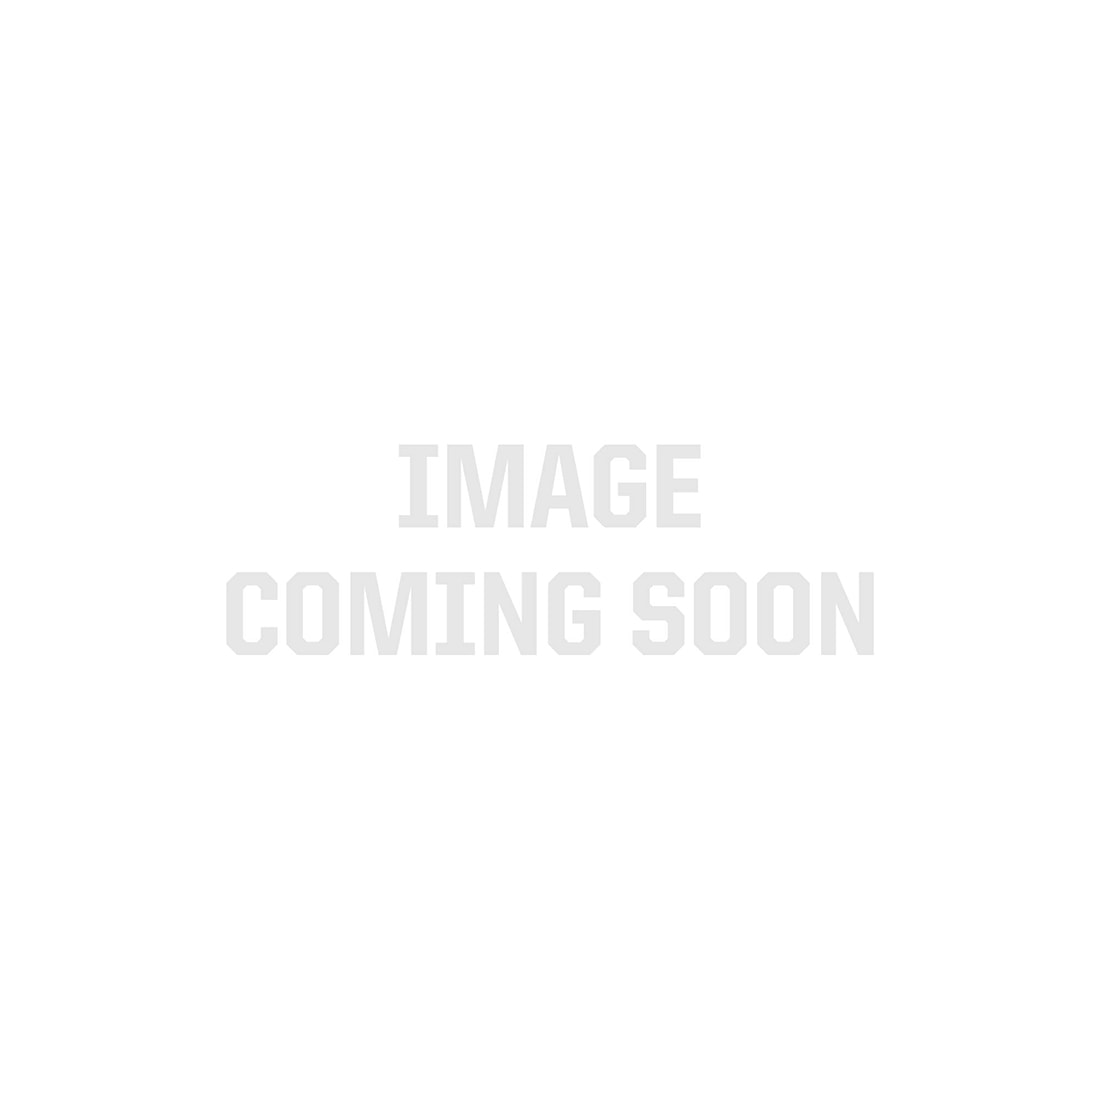 Waterproof White Adjustable 3528 Quad Row LED Strip Light, 450/m, 28mm wide, Sample Kit